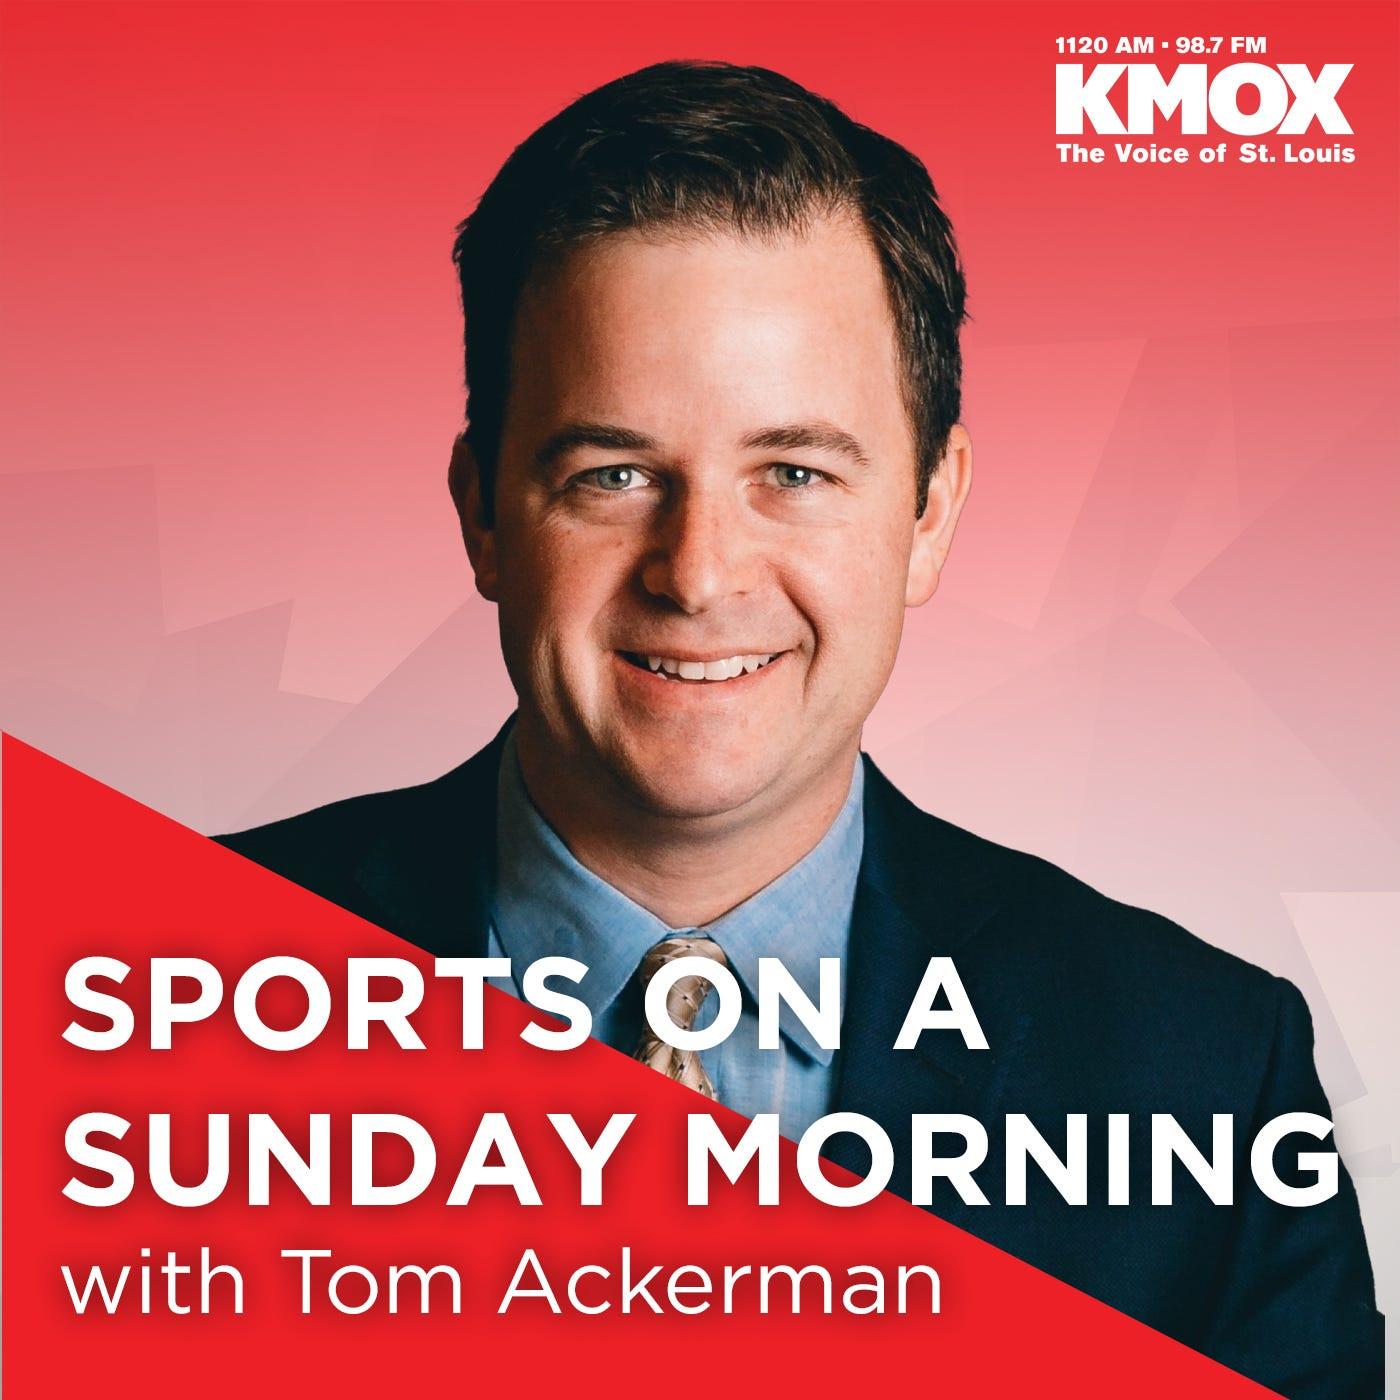 Sports on a Sunday Morning